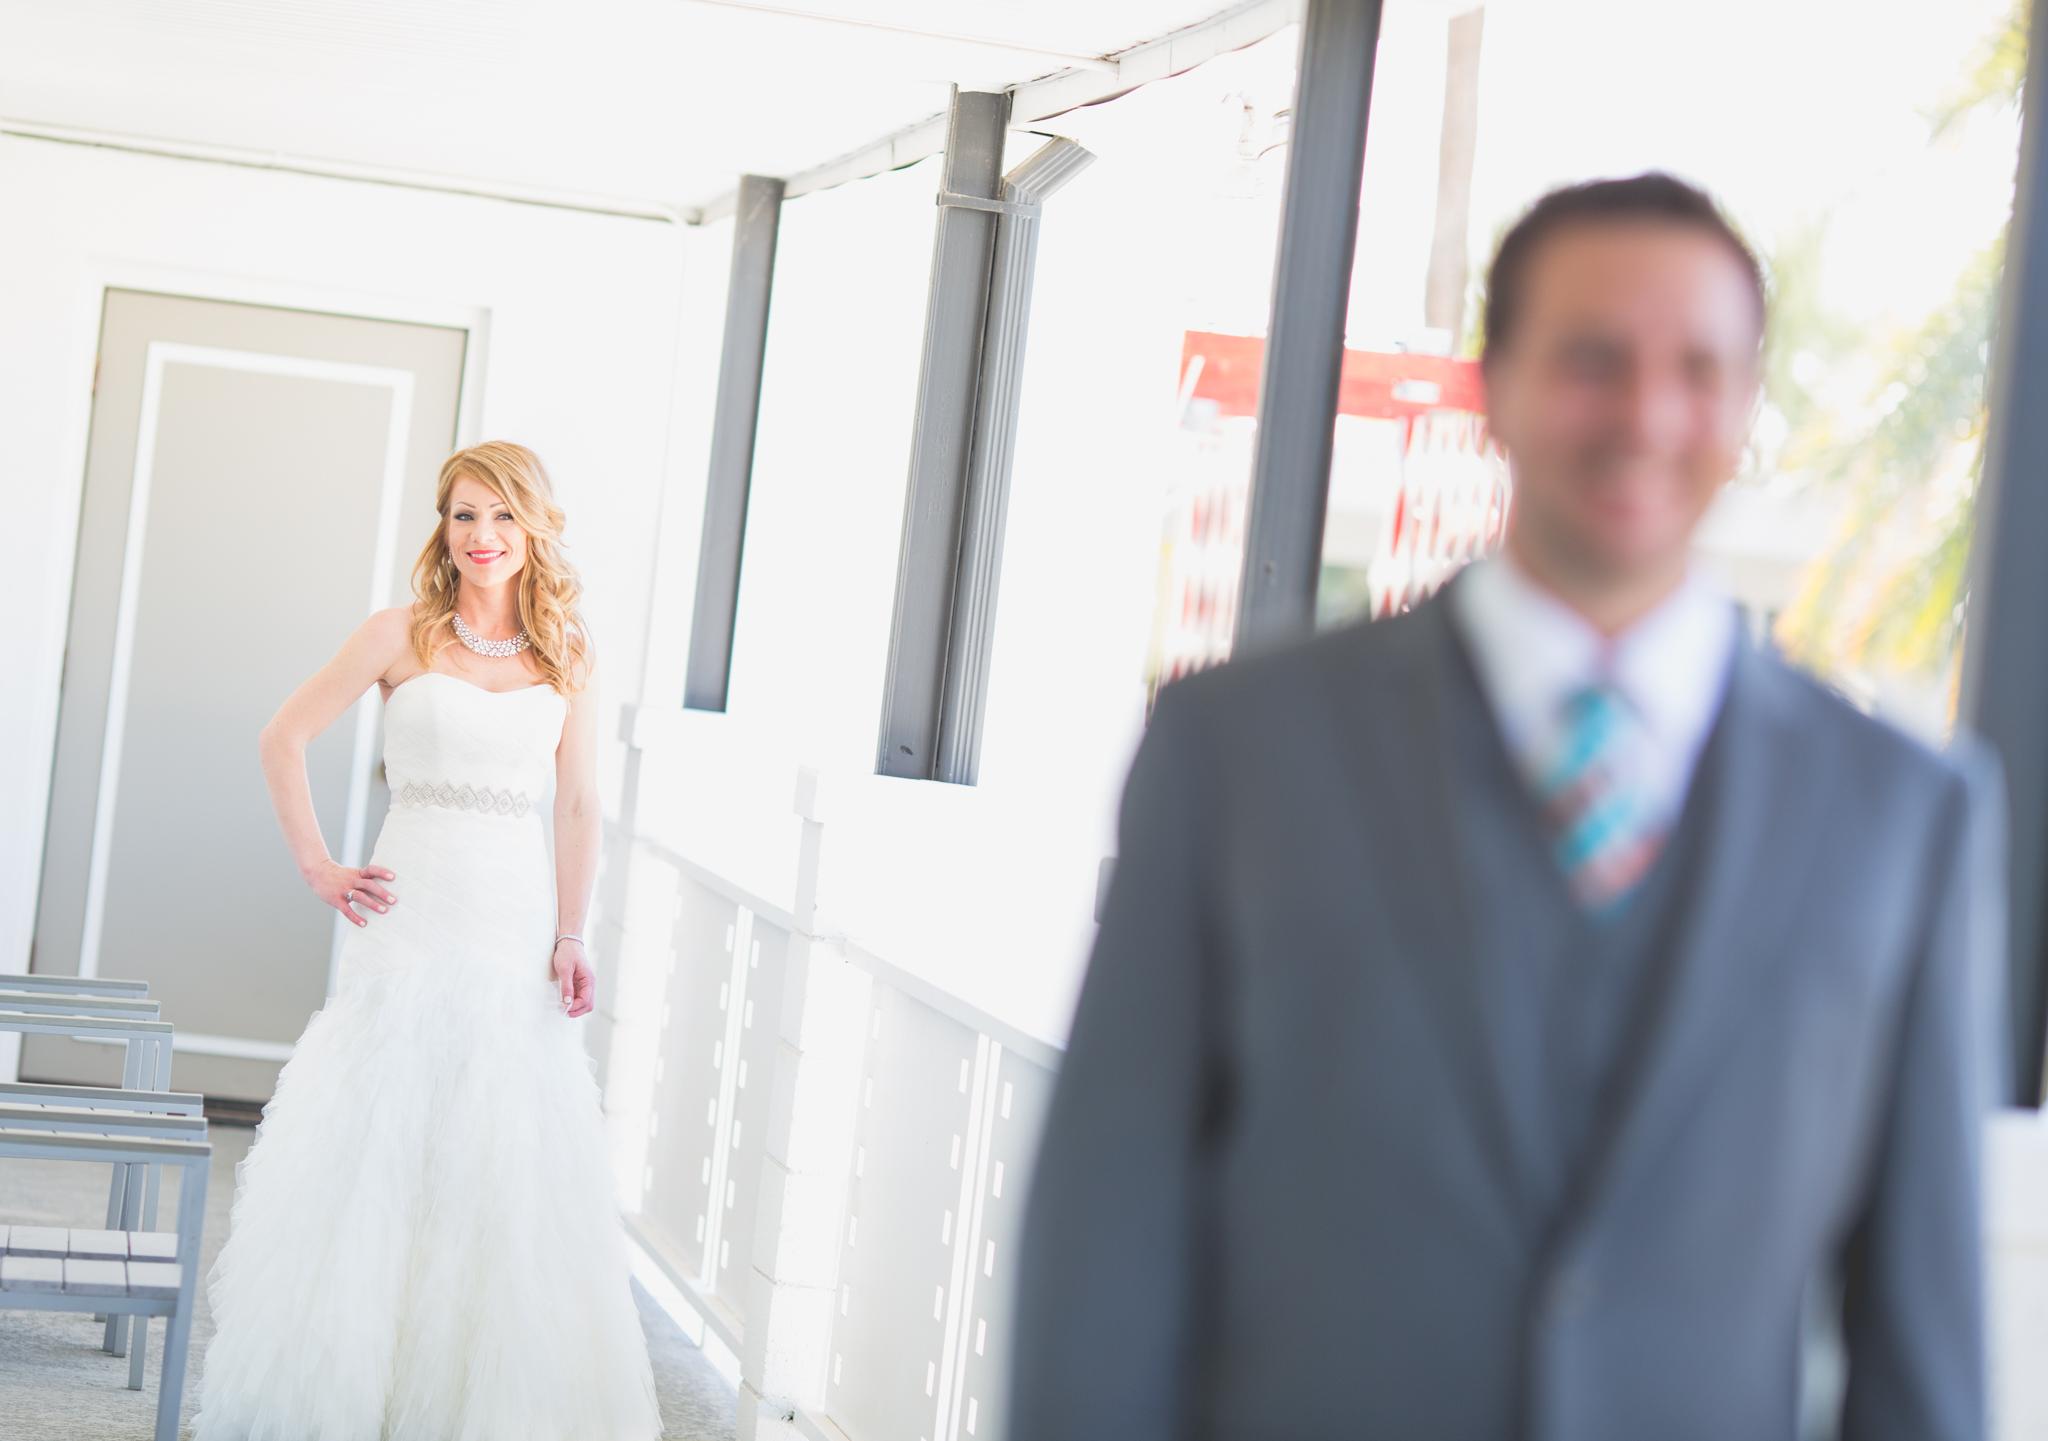 scottsdale-wedding-photographer-el-dorado-andrea-first-look